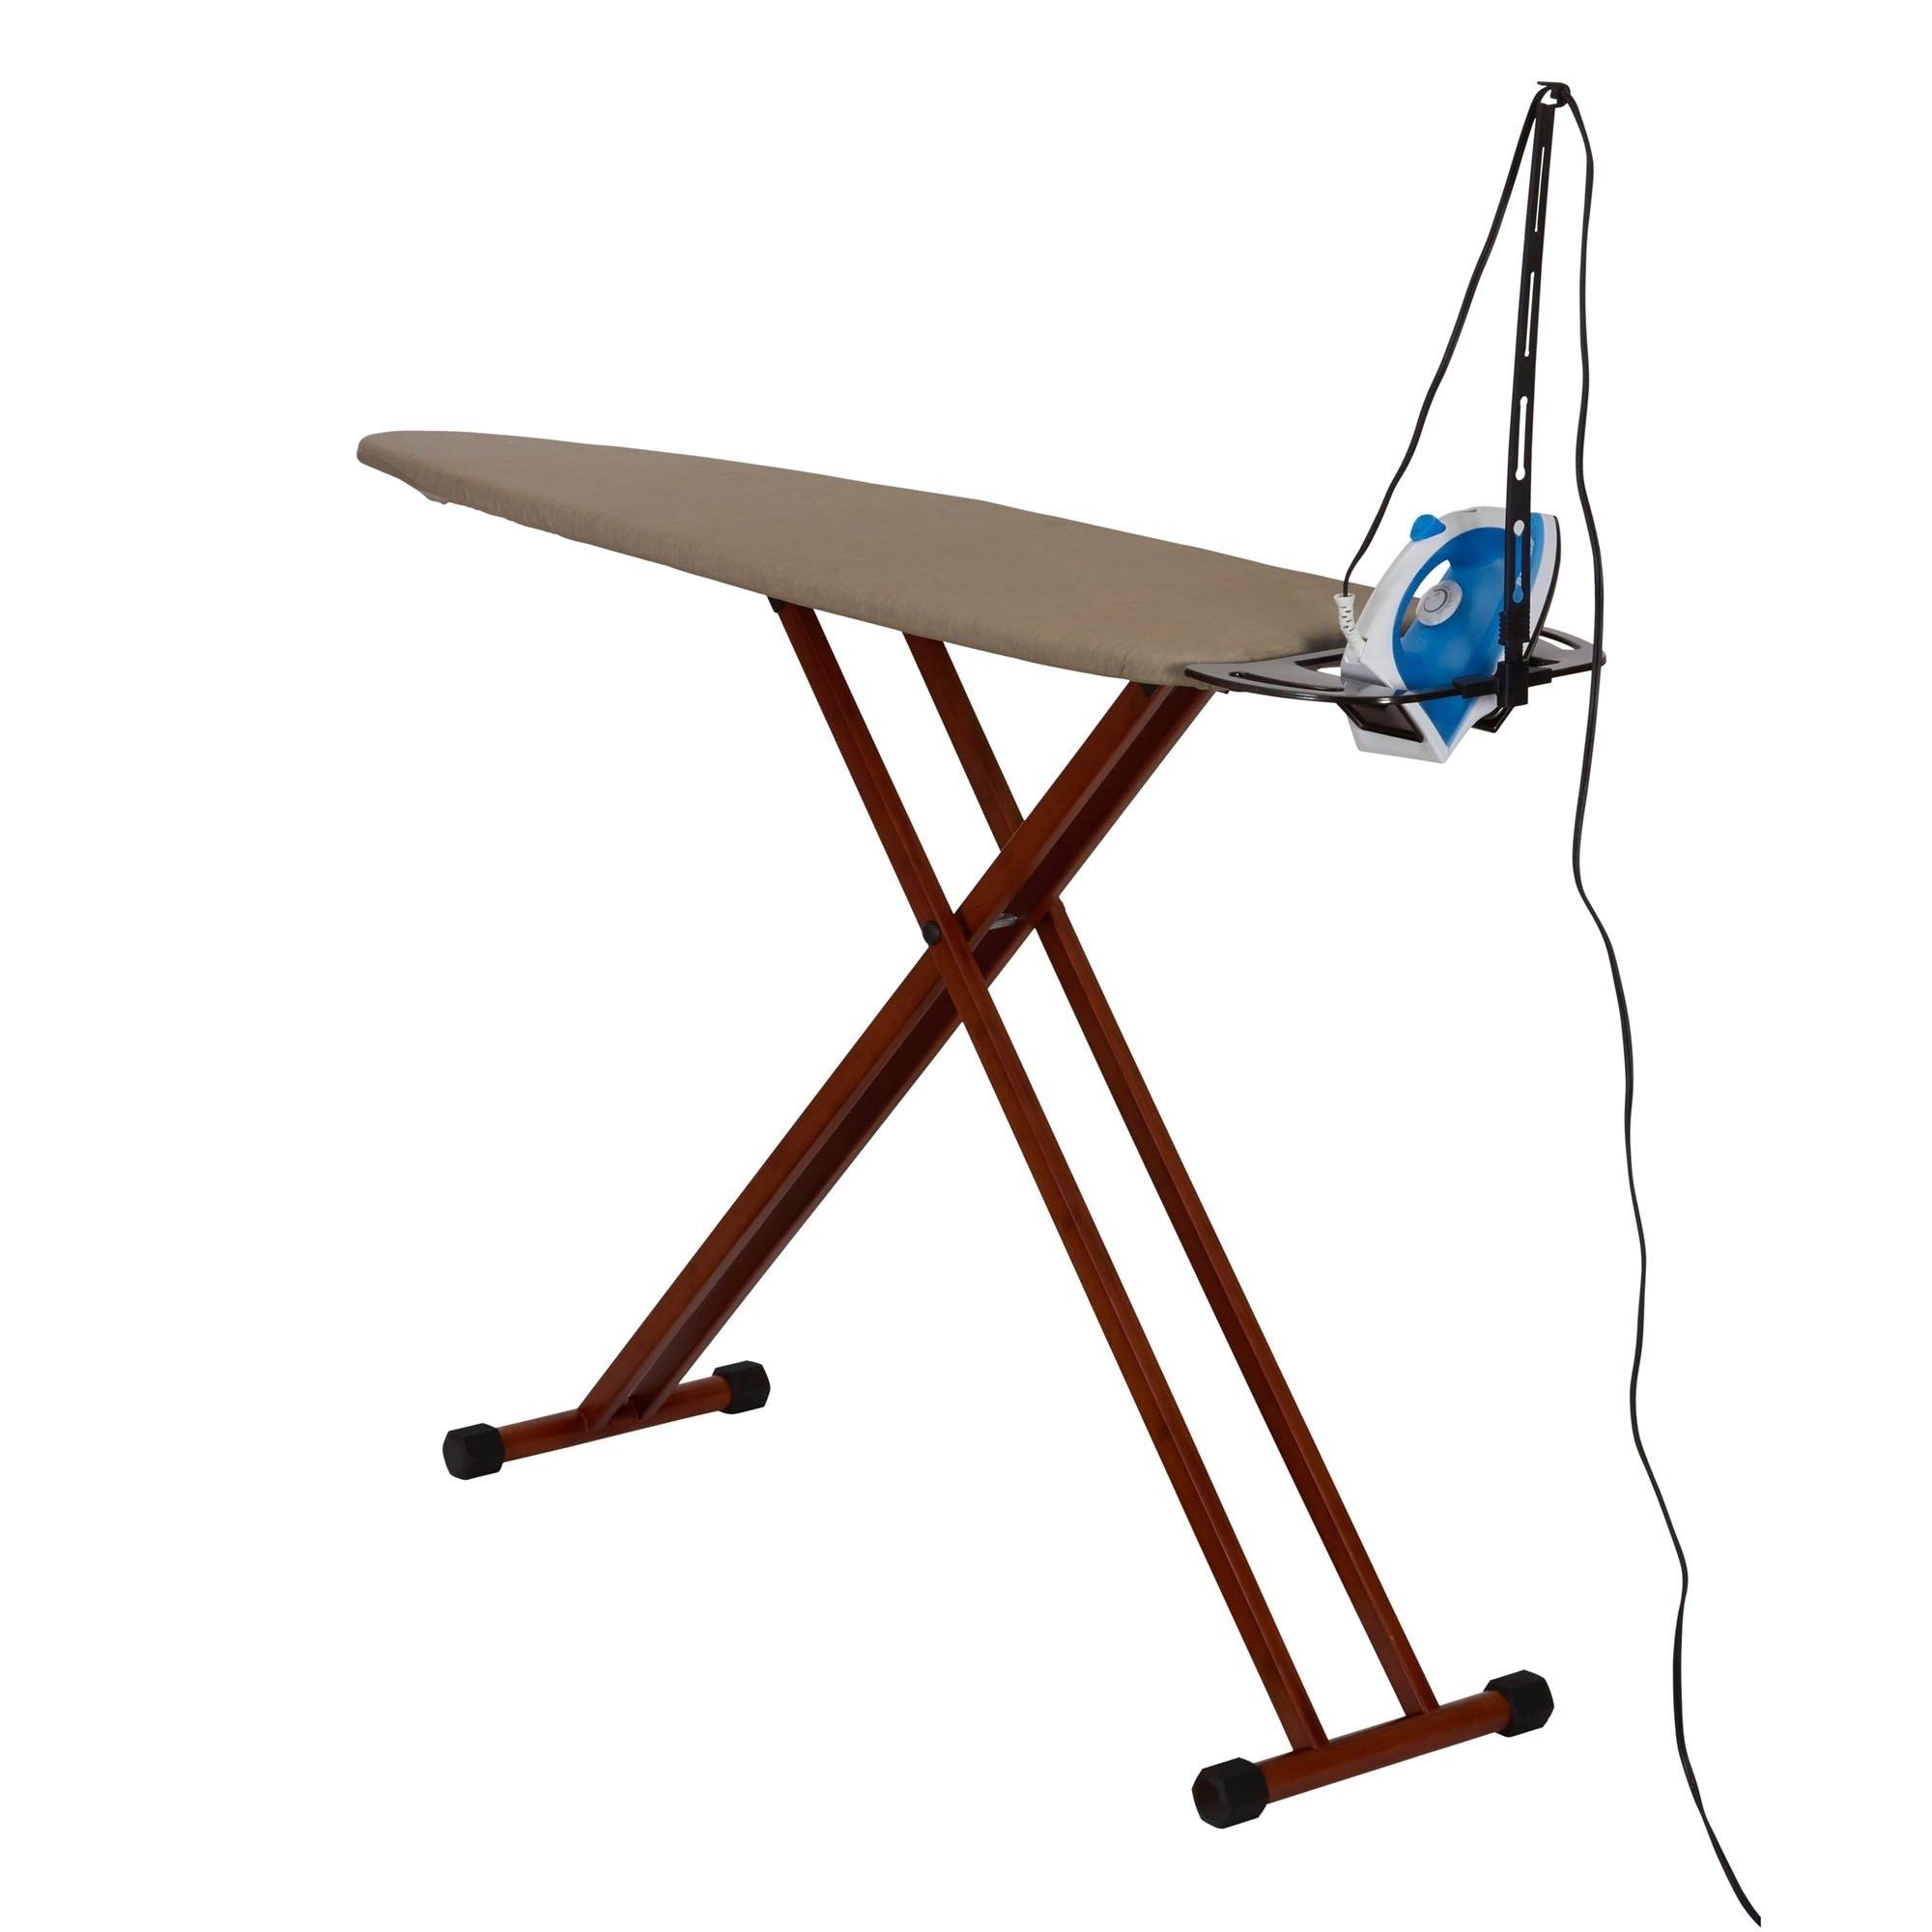 MattsGlobal Bamboo Leg Ironing Board with Iron Rest Cotton Wood Free Standing Iron Holder Dark Frame by MattsGlobal (Image #2)